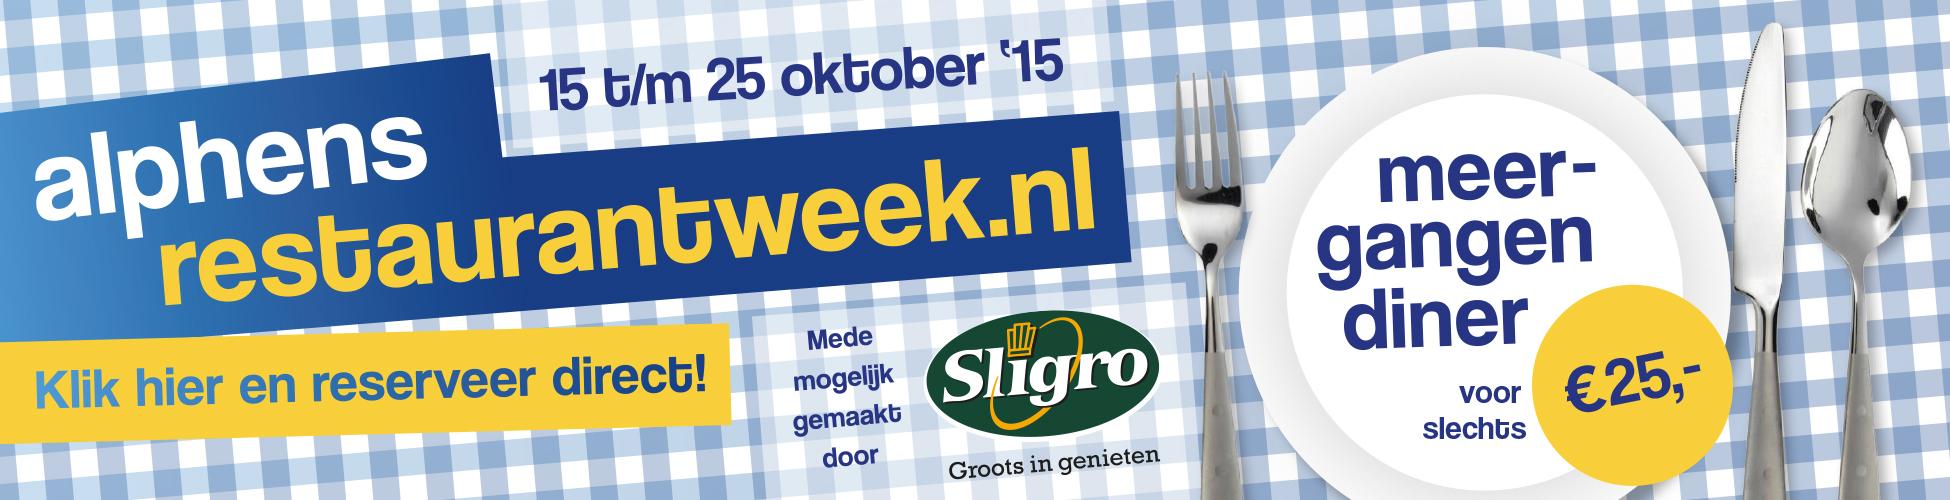 Alphens Restaurantweek